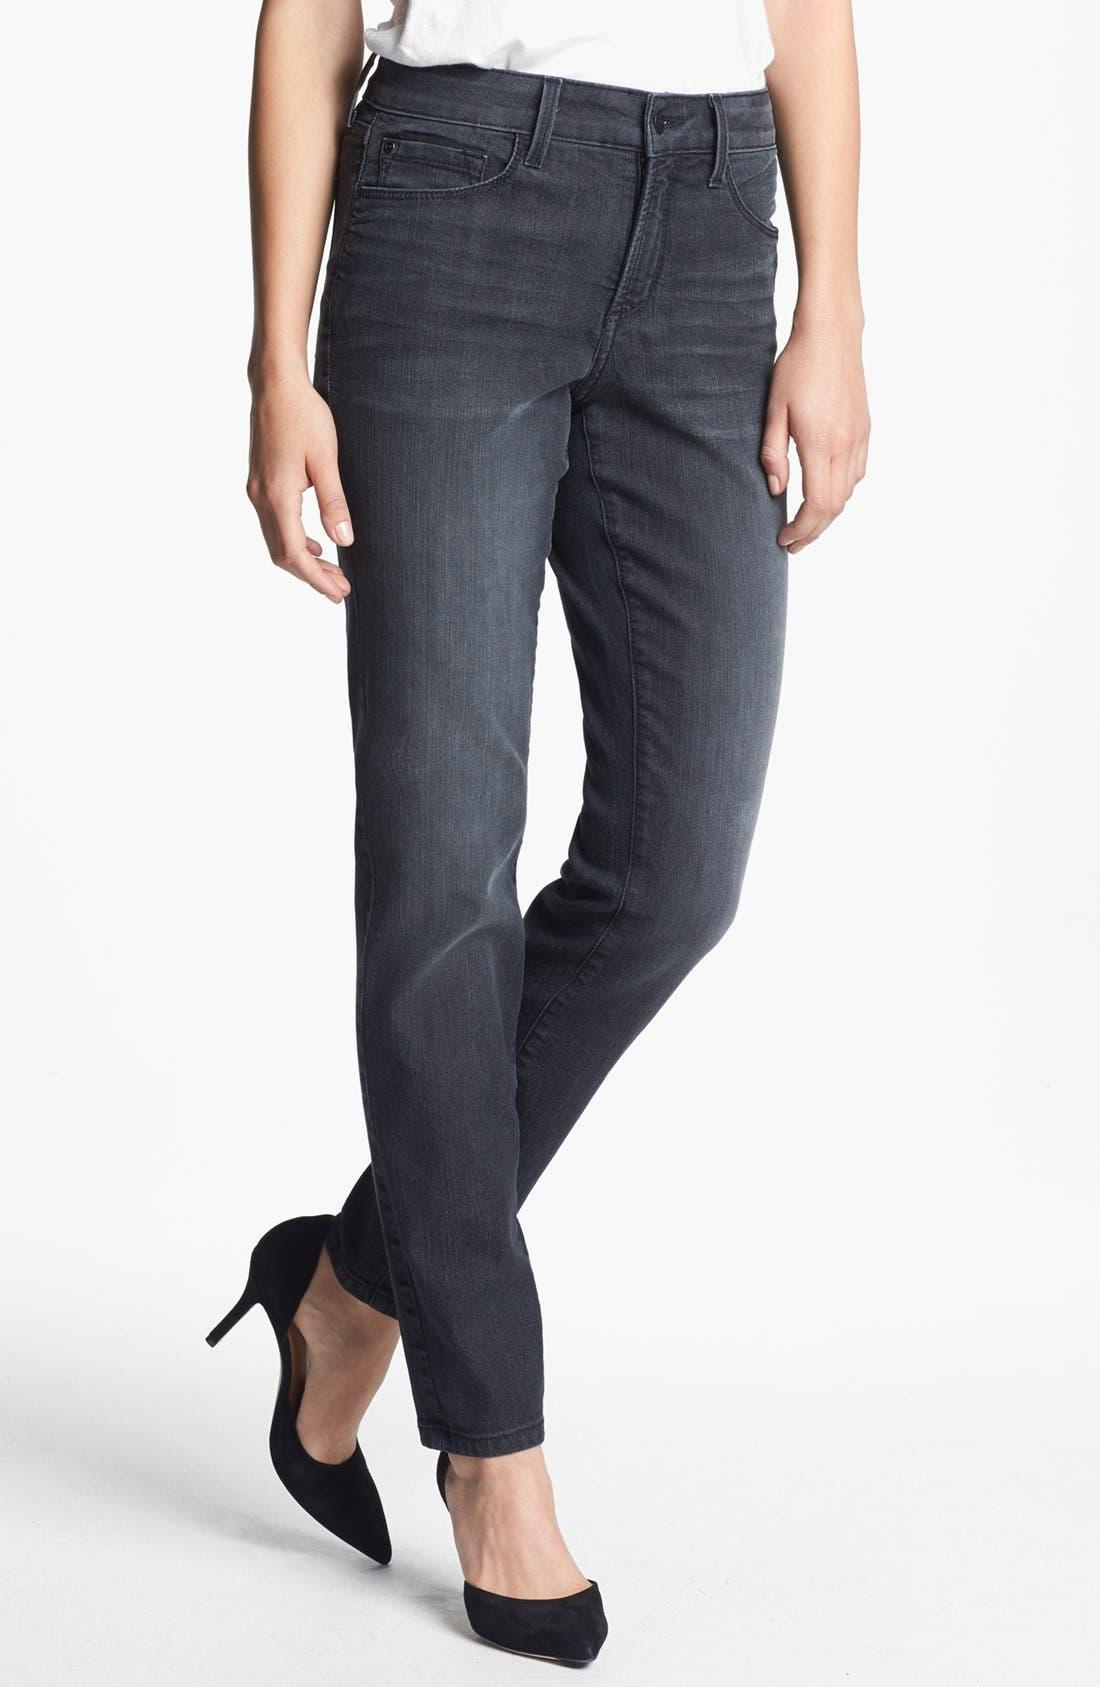 Main Image - NYDJ 'Alina' Stretch Skinny Jeans (Stoney River) (Regular & Petite)